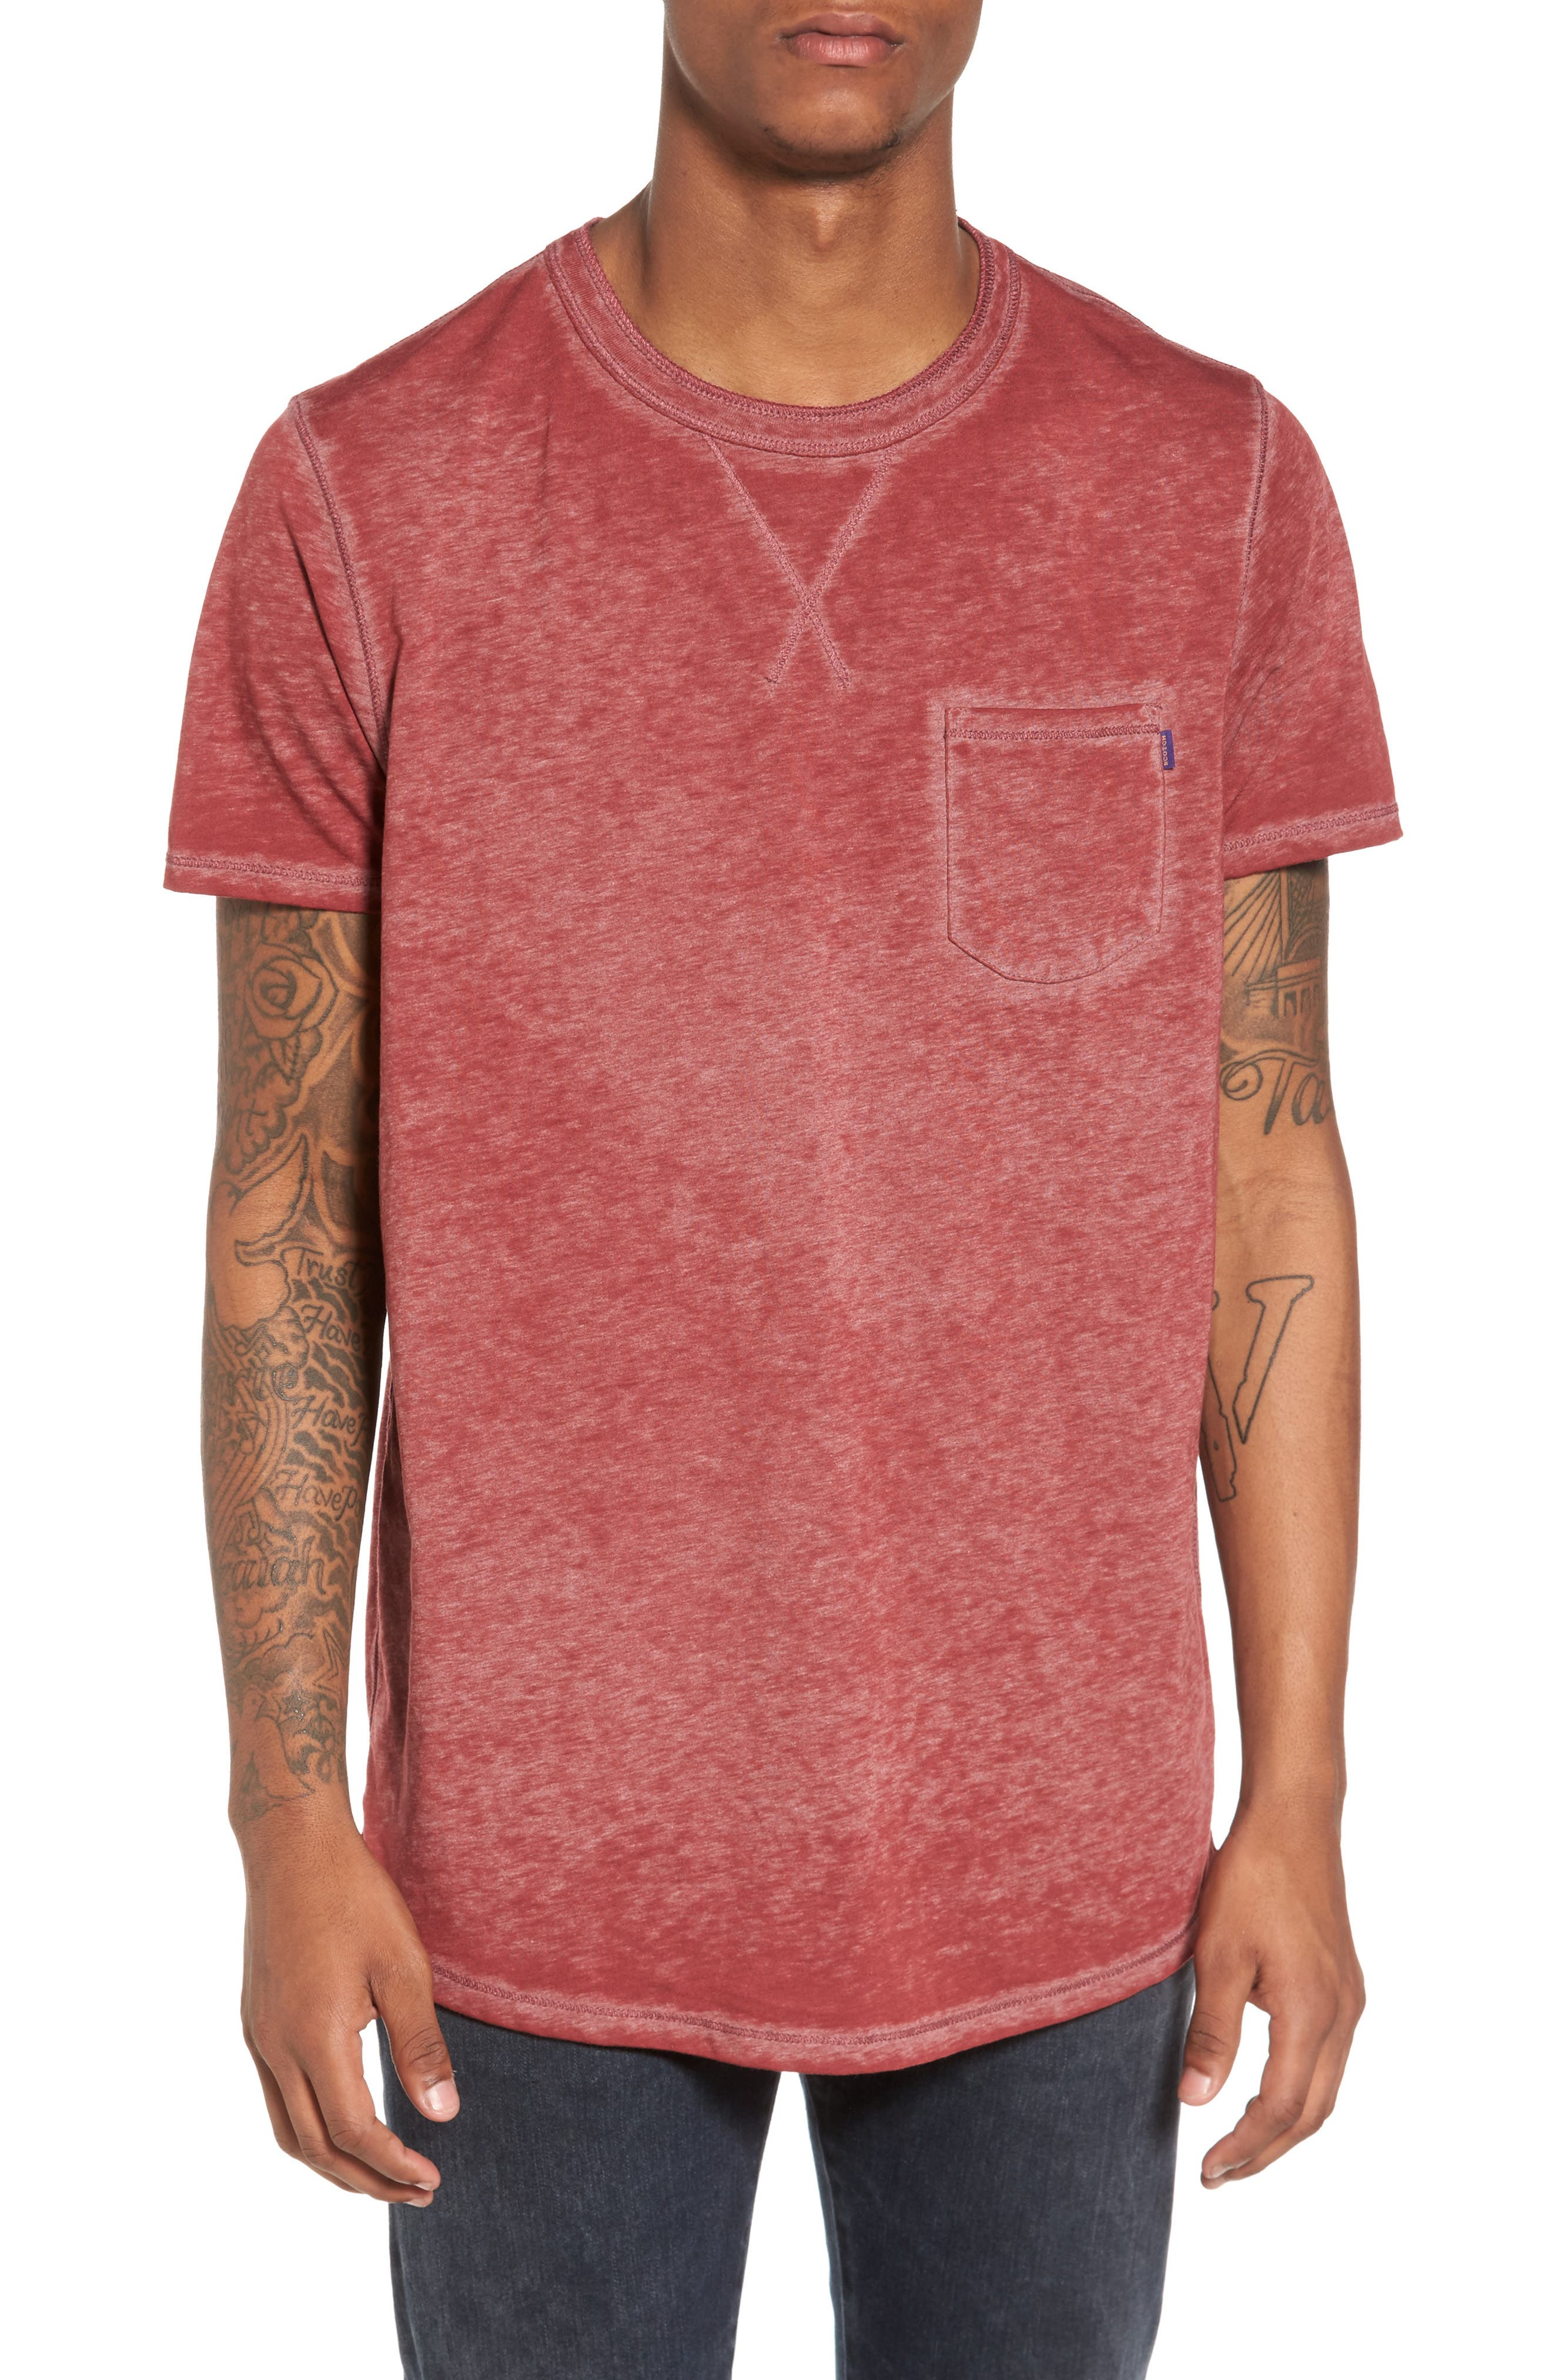 Main Image - Scotch & Soda Pocket T-Shirt